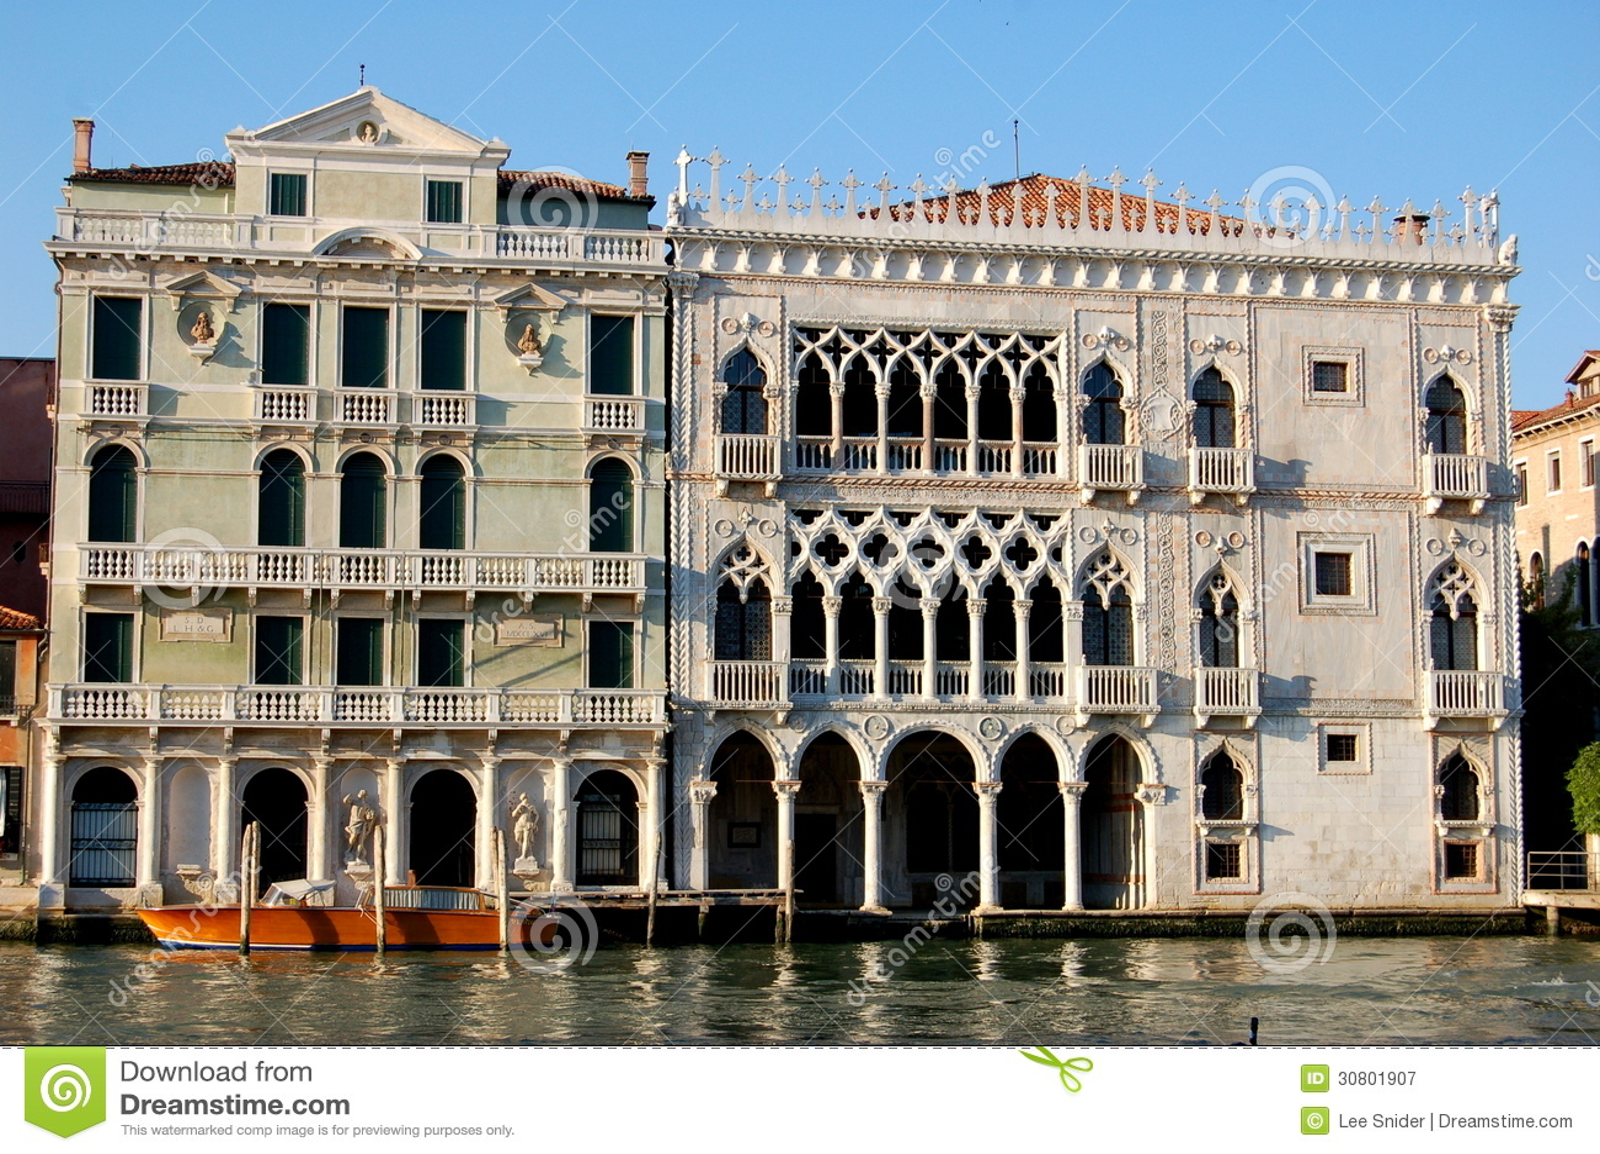 Venice Italy Palazzo Ca D Oro Stock Image Image Of